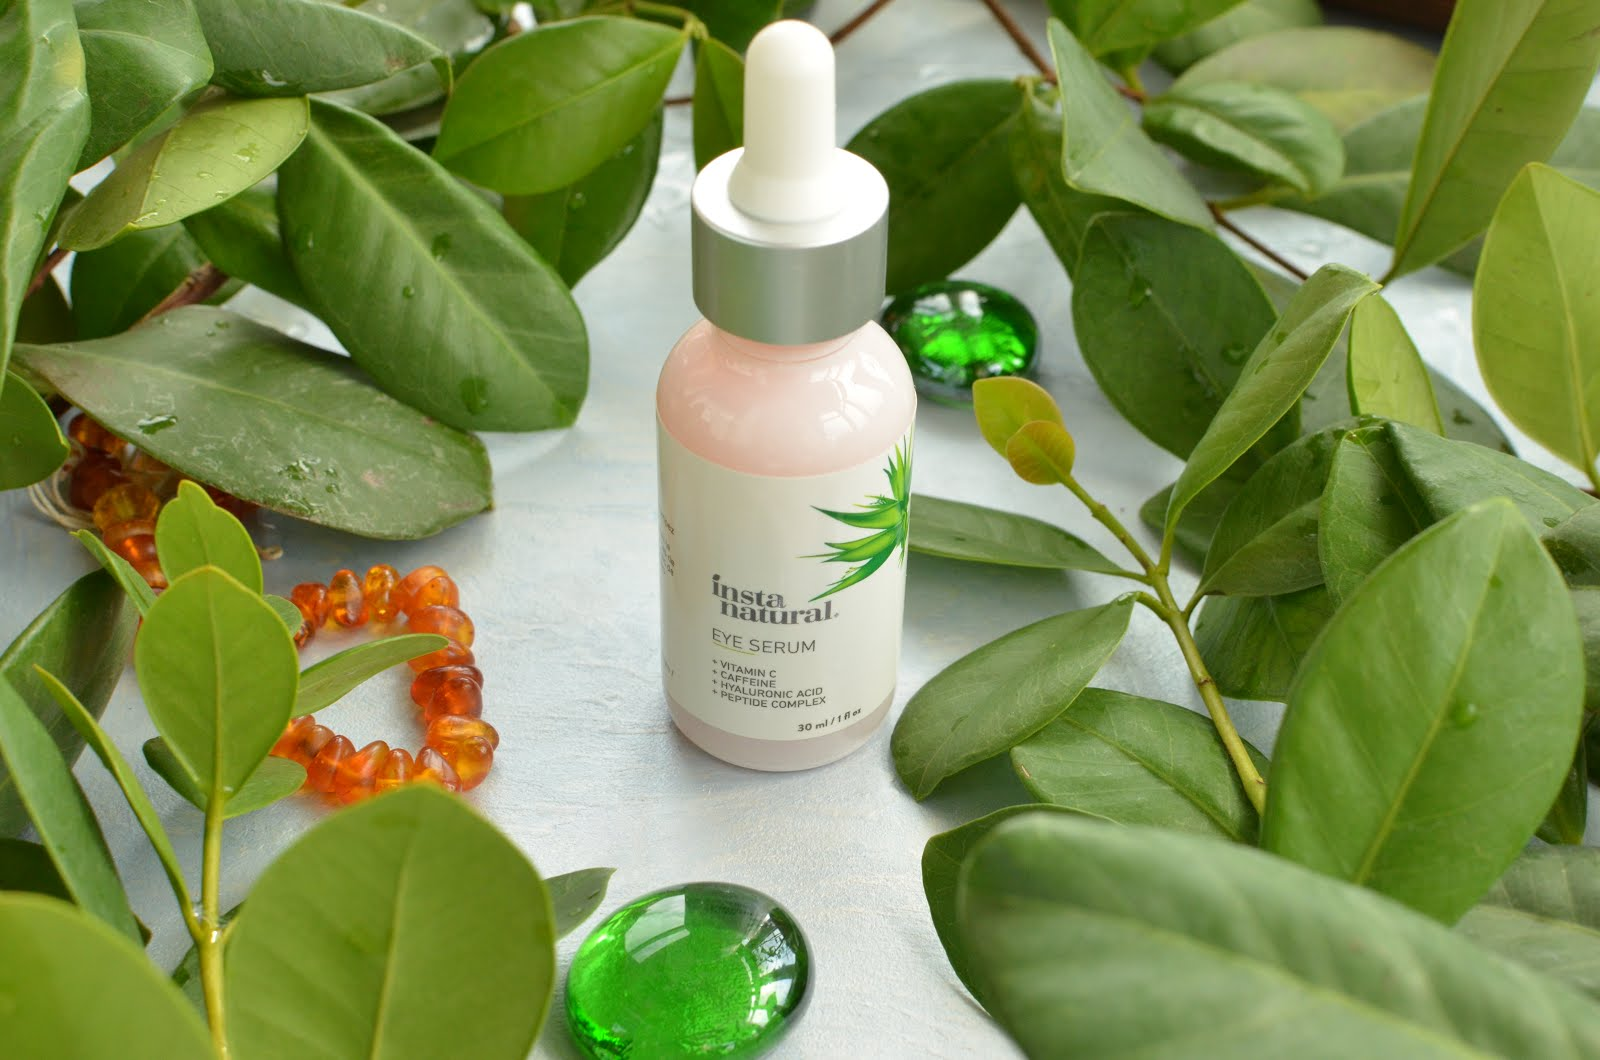 InstaNatural  Eye Serum Anti-Aging with Vitamin C, Caffeine, Hyaluronic Acid, Peptide Complex.  Антивозрастная сыворотка для зоны вокруг  глаз